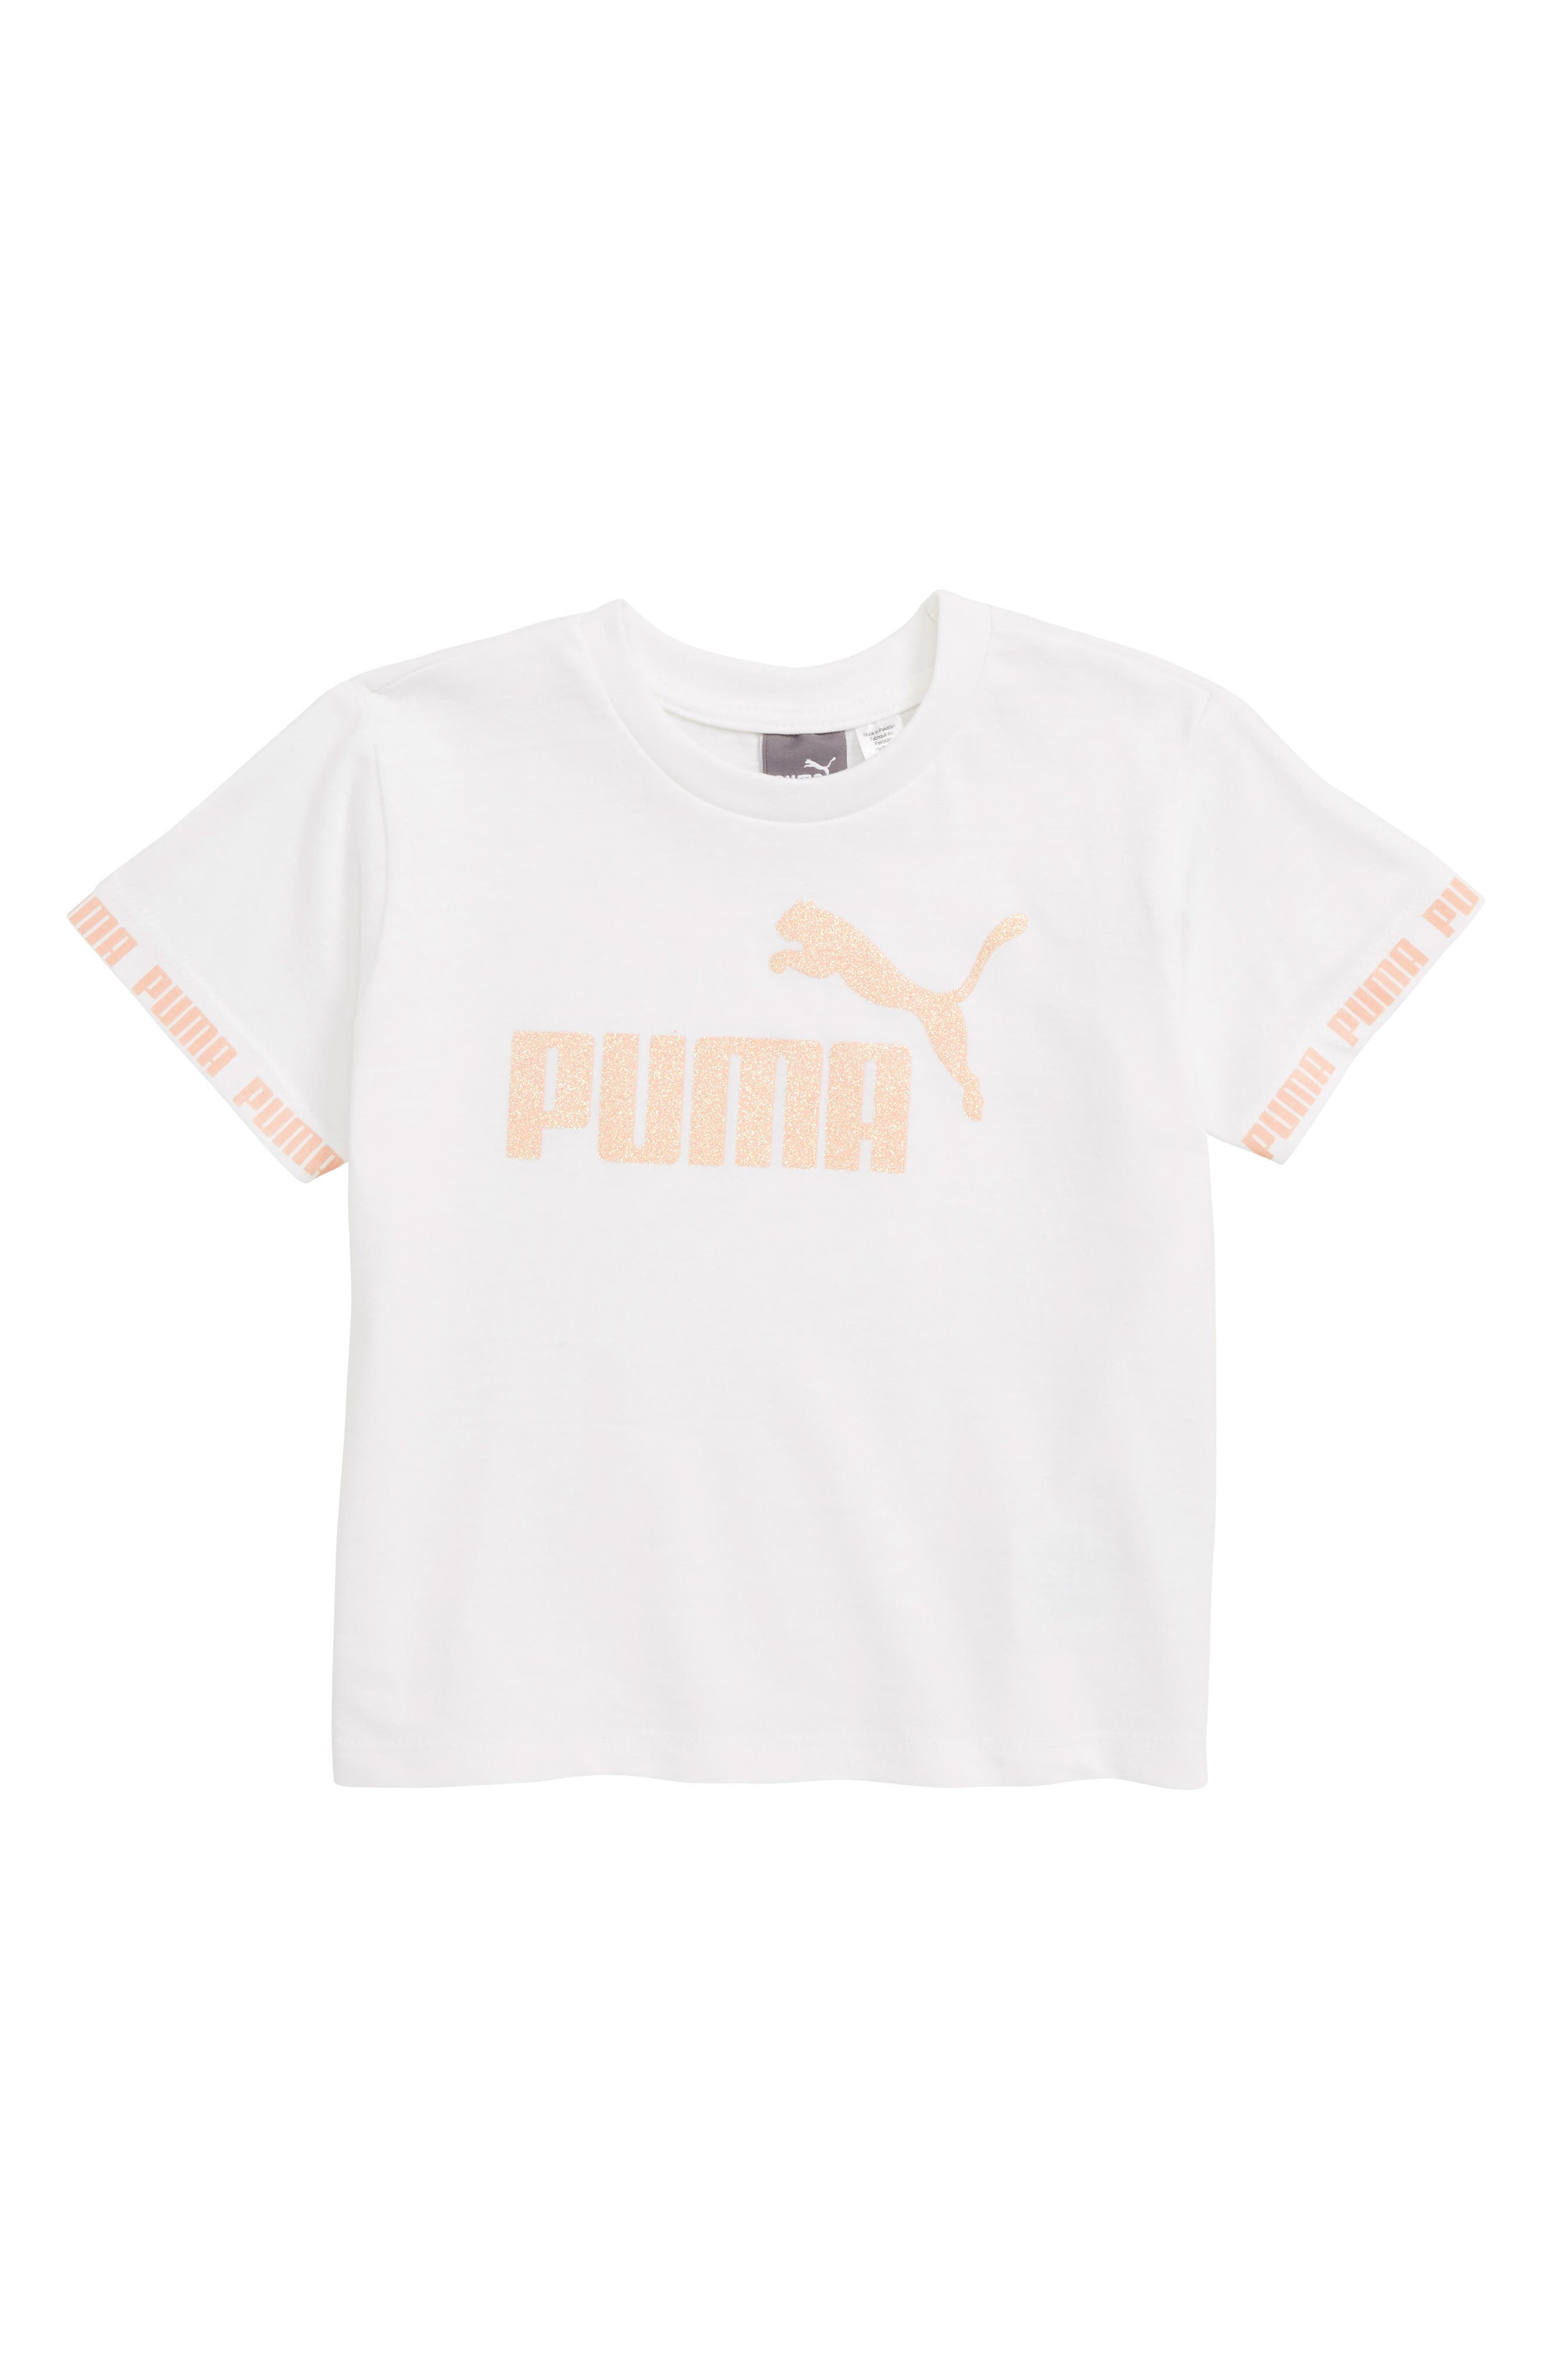 PUMA, Amplified Logo Tee, Main thumbnail 1, color, 100